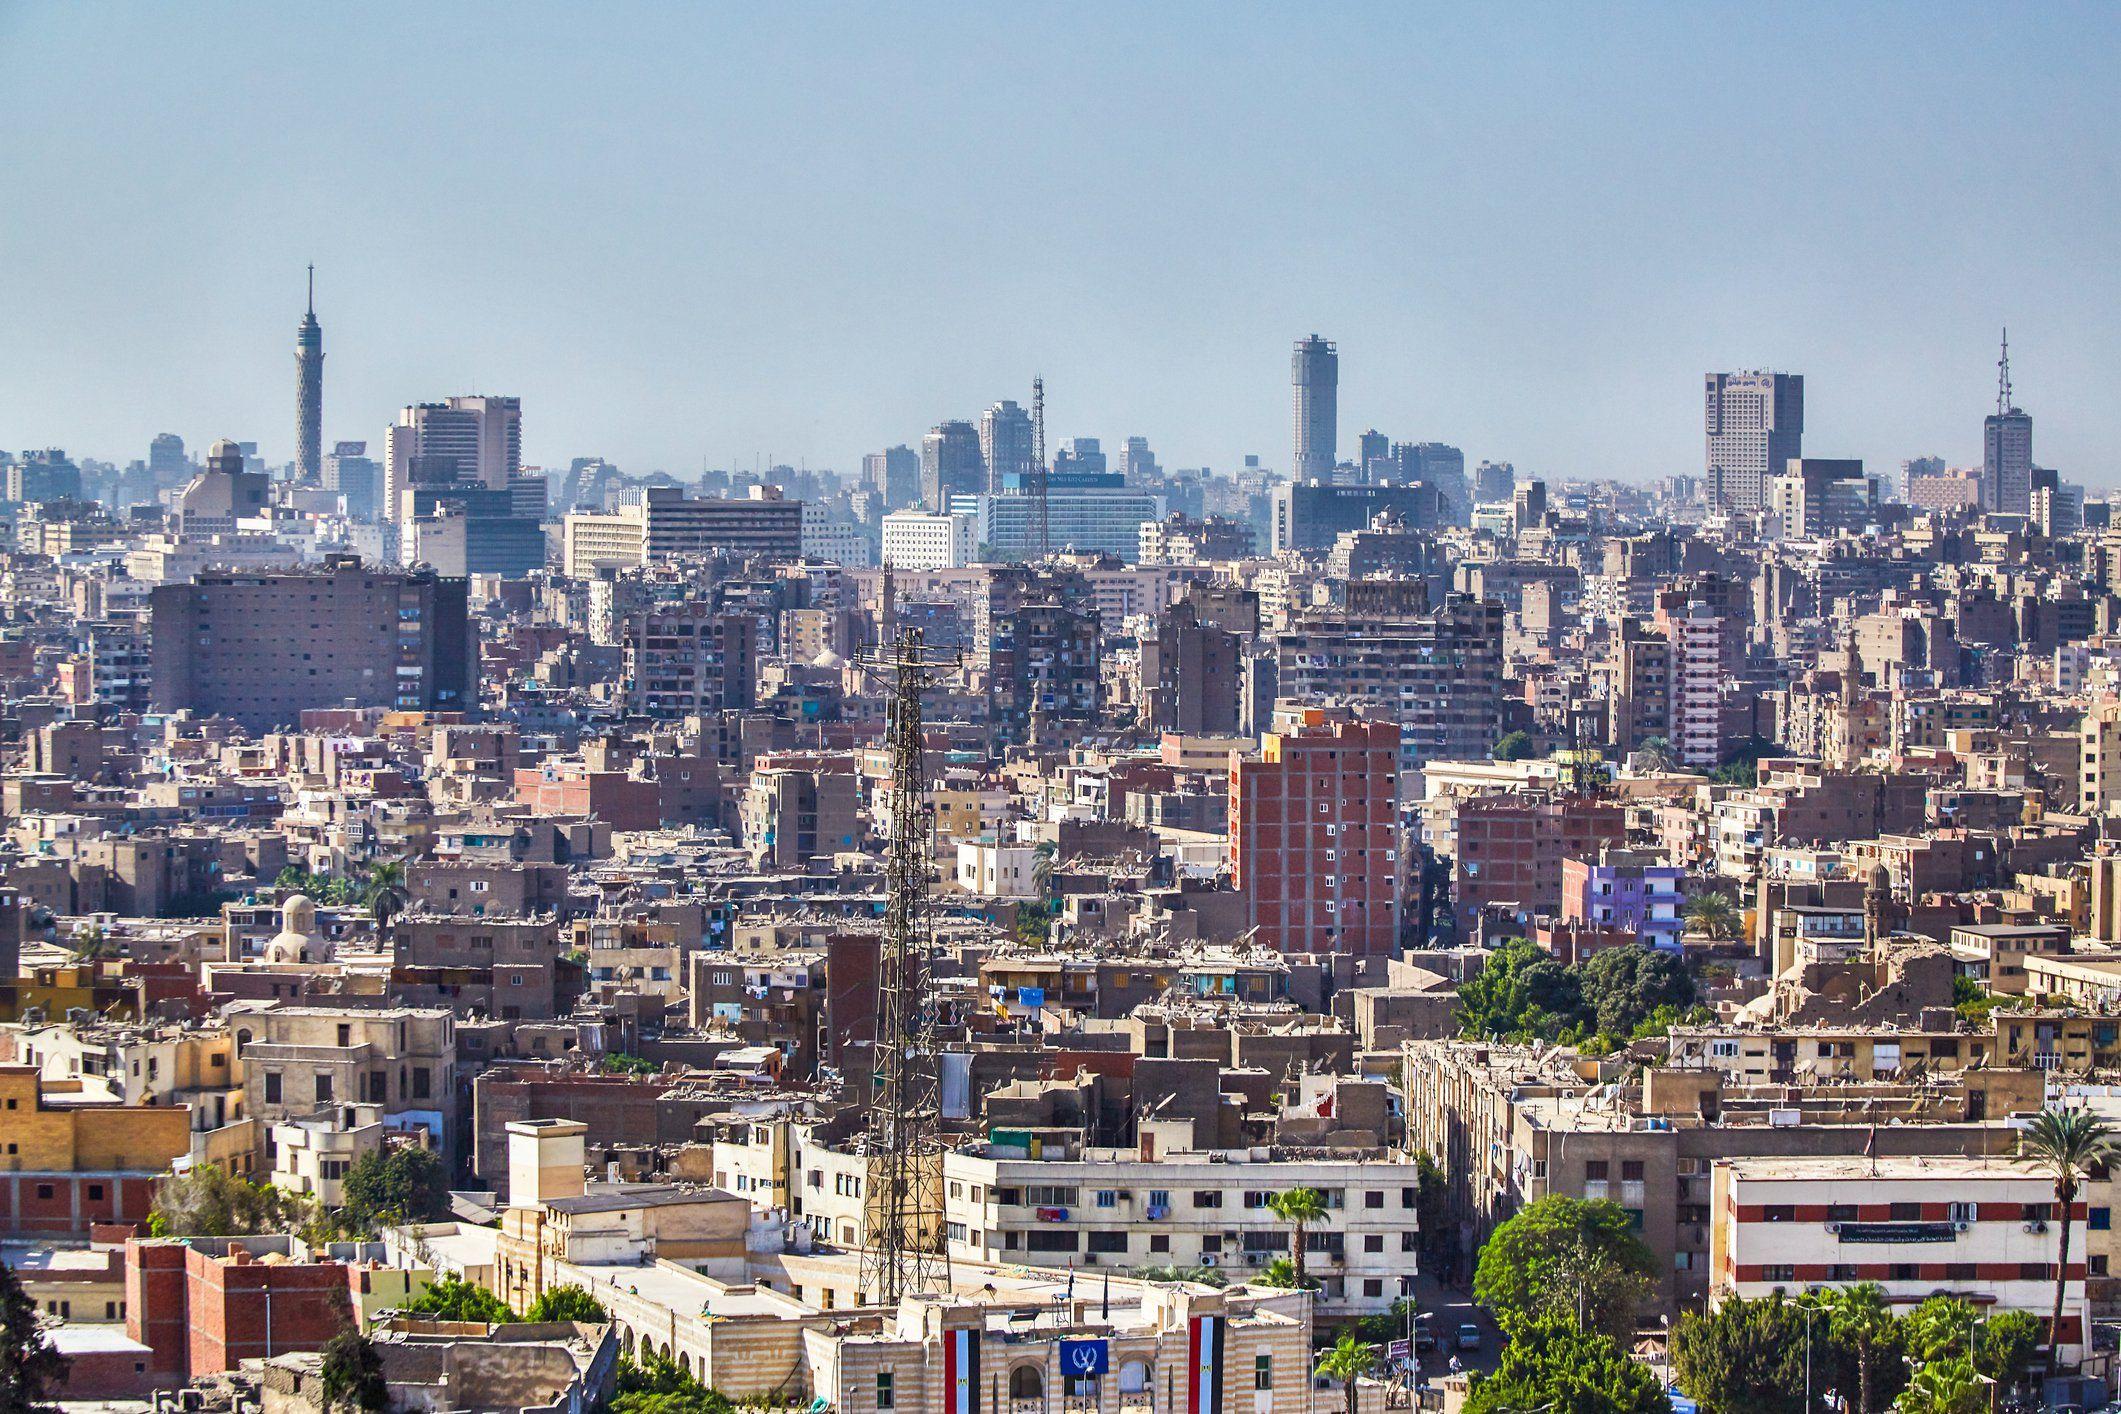 Population Growth Egypt's 'Biggest Challenge': Prime ...